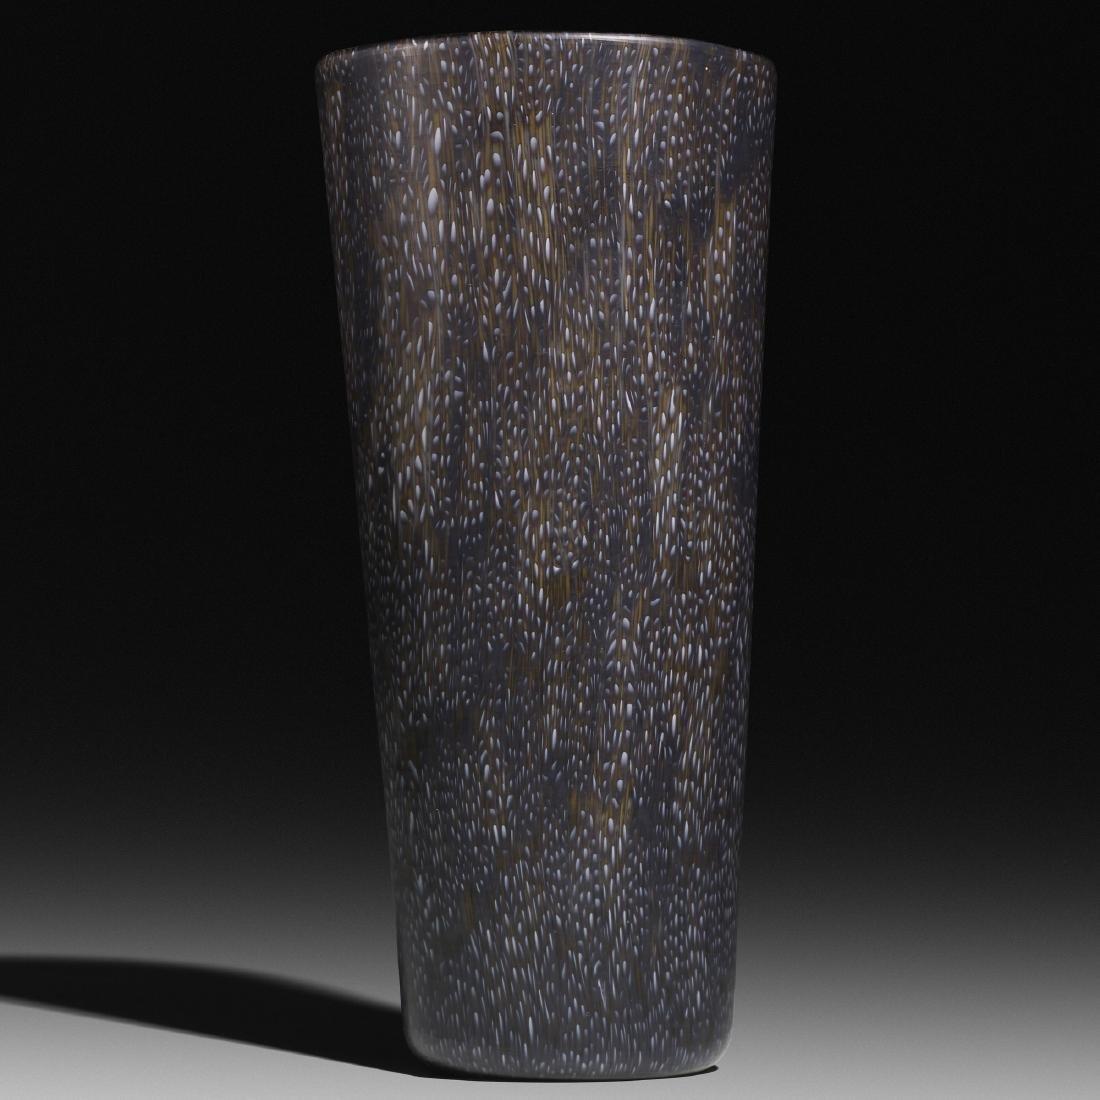 Paolo Venini, A Puntini Murrine vase